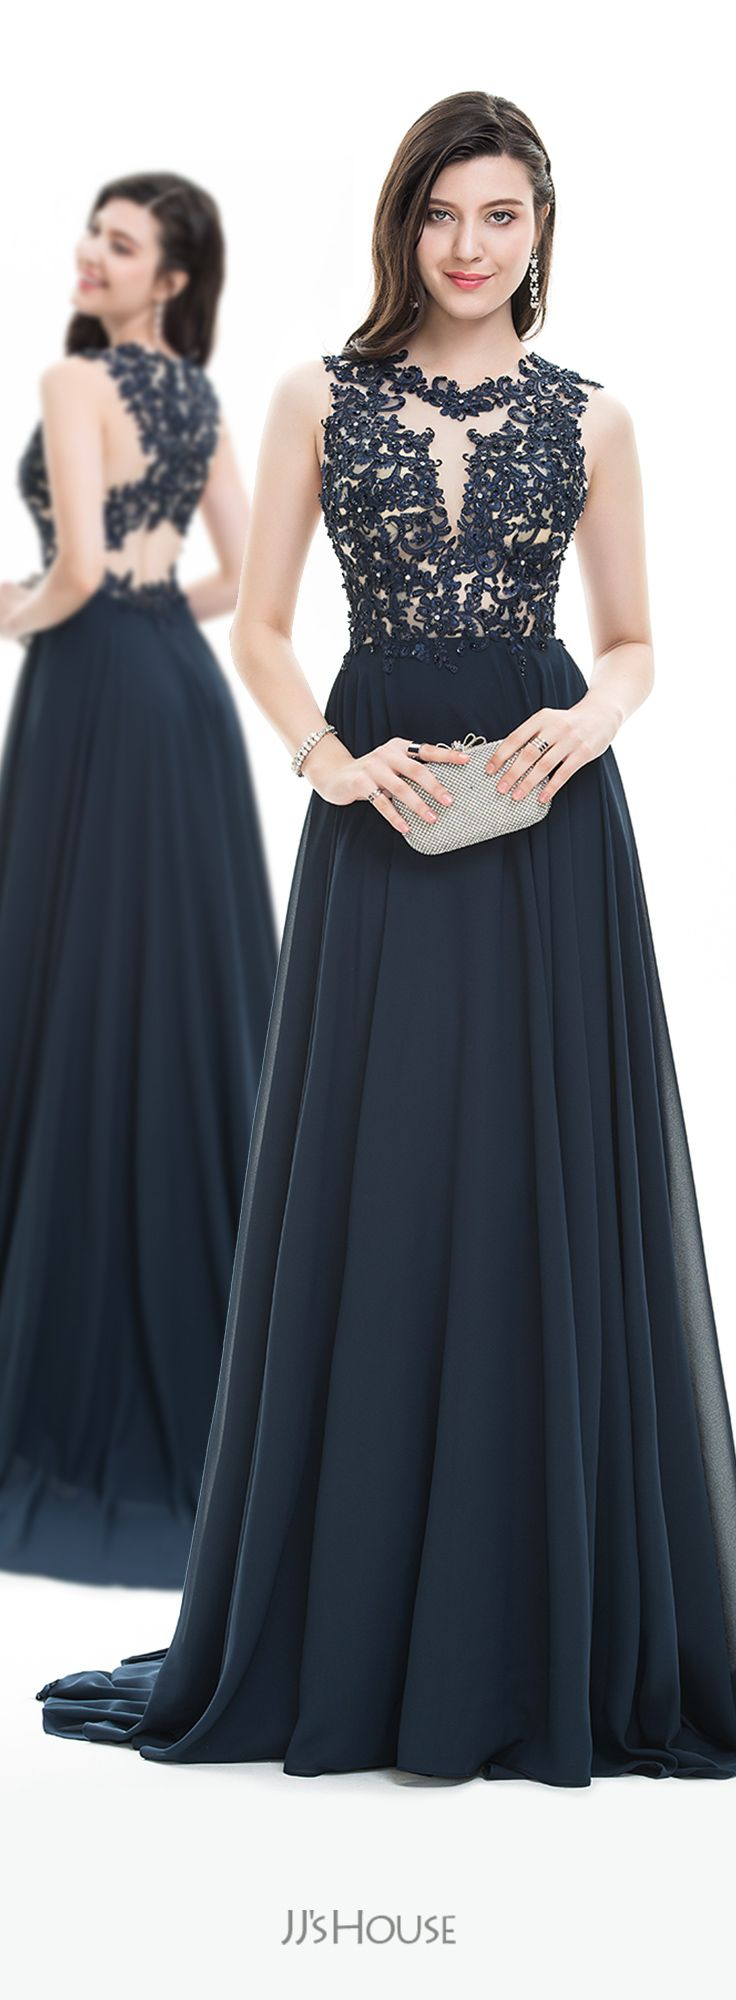 Jjshouse prom vestido longo azul bic pinterest prom gowns